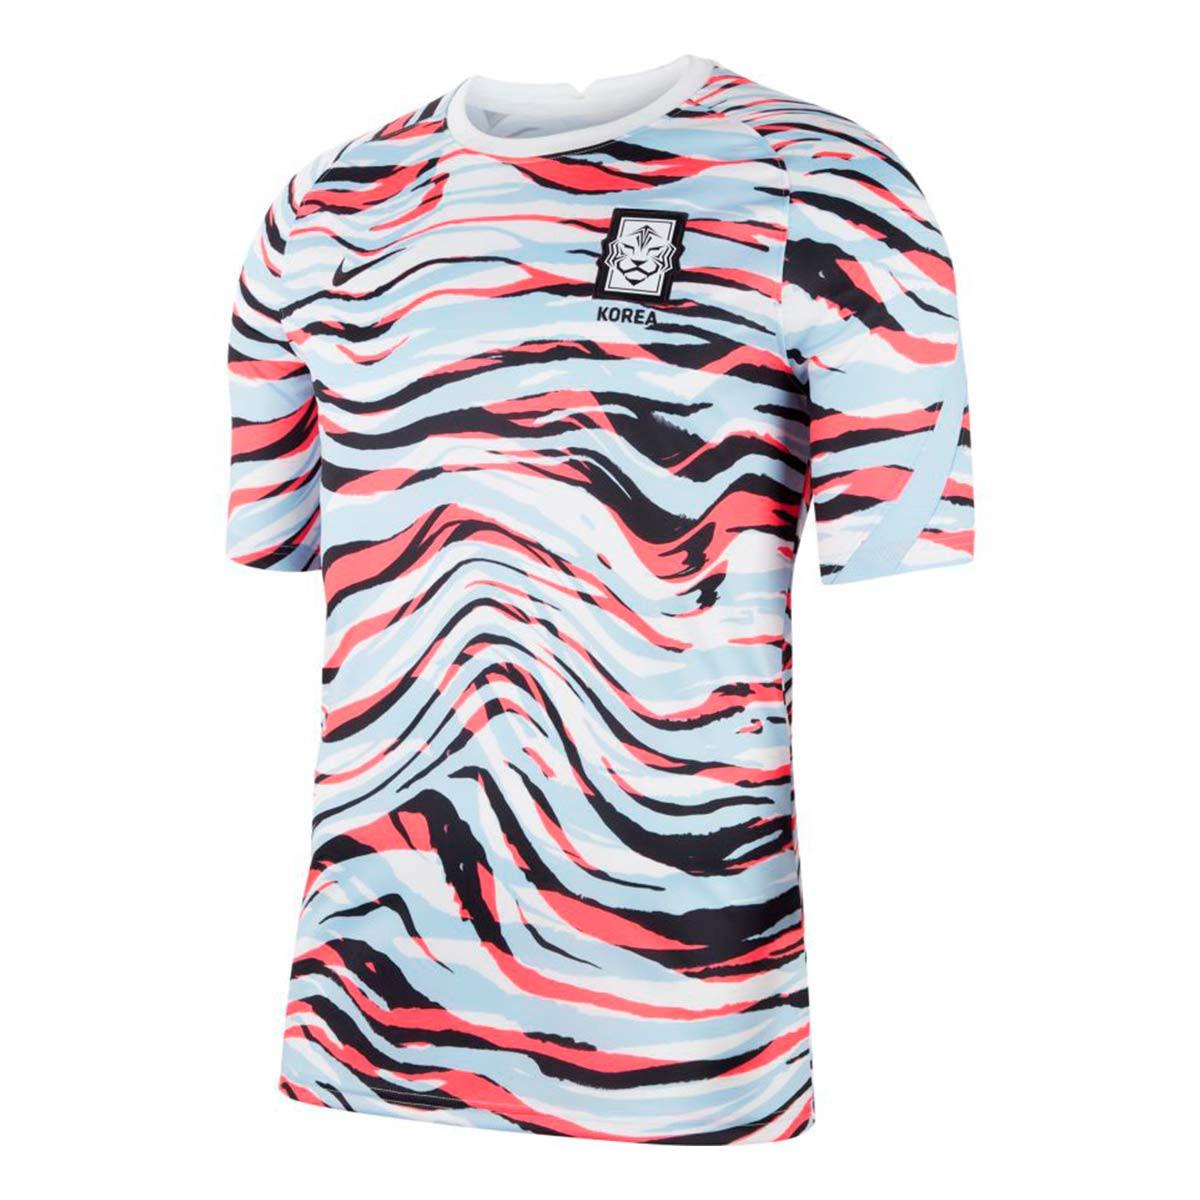 Rezumar salir Malawi  Camiseta Nike South Korea Pre Match Top 2020-2021 White-Royal tint-Black -  Tienda de fútbol Fútbol Emotion